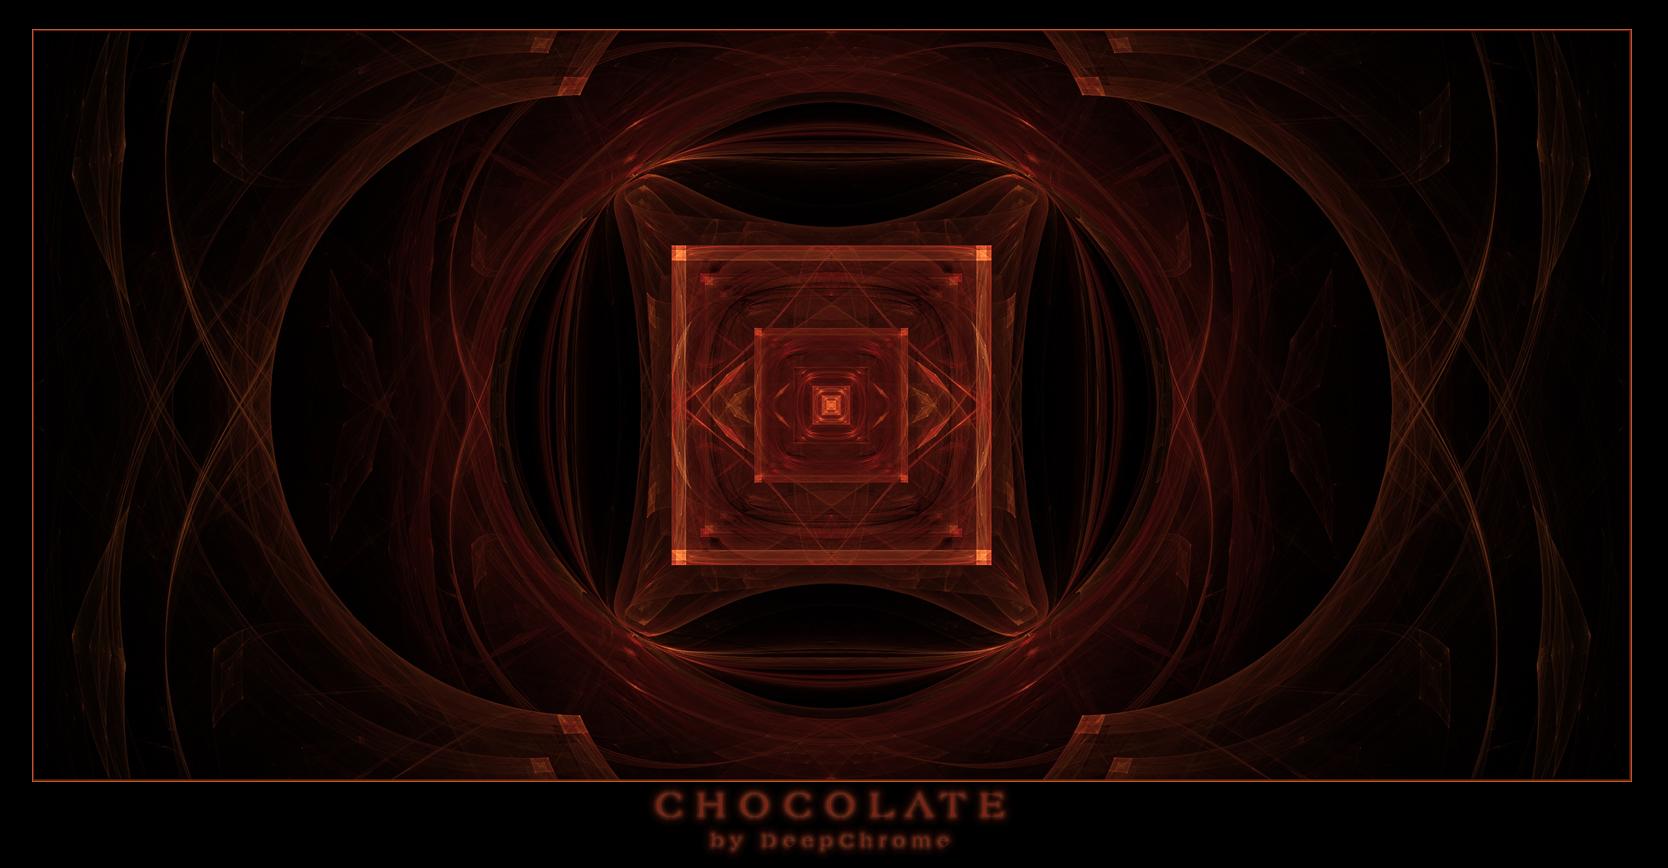 CHOCOLATE by DeepChrome